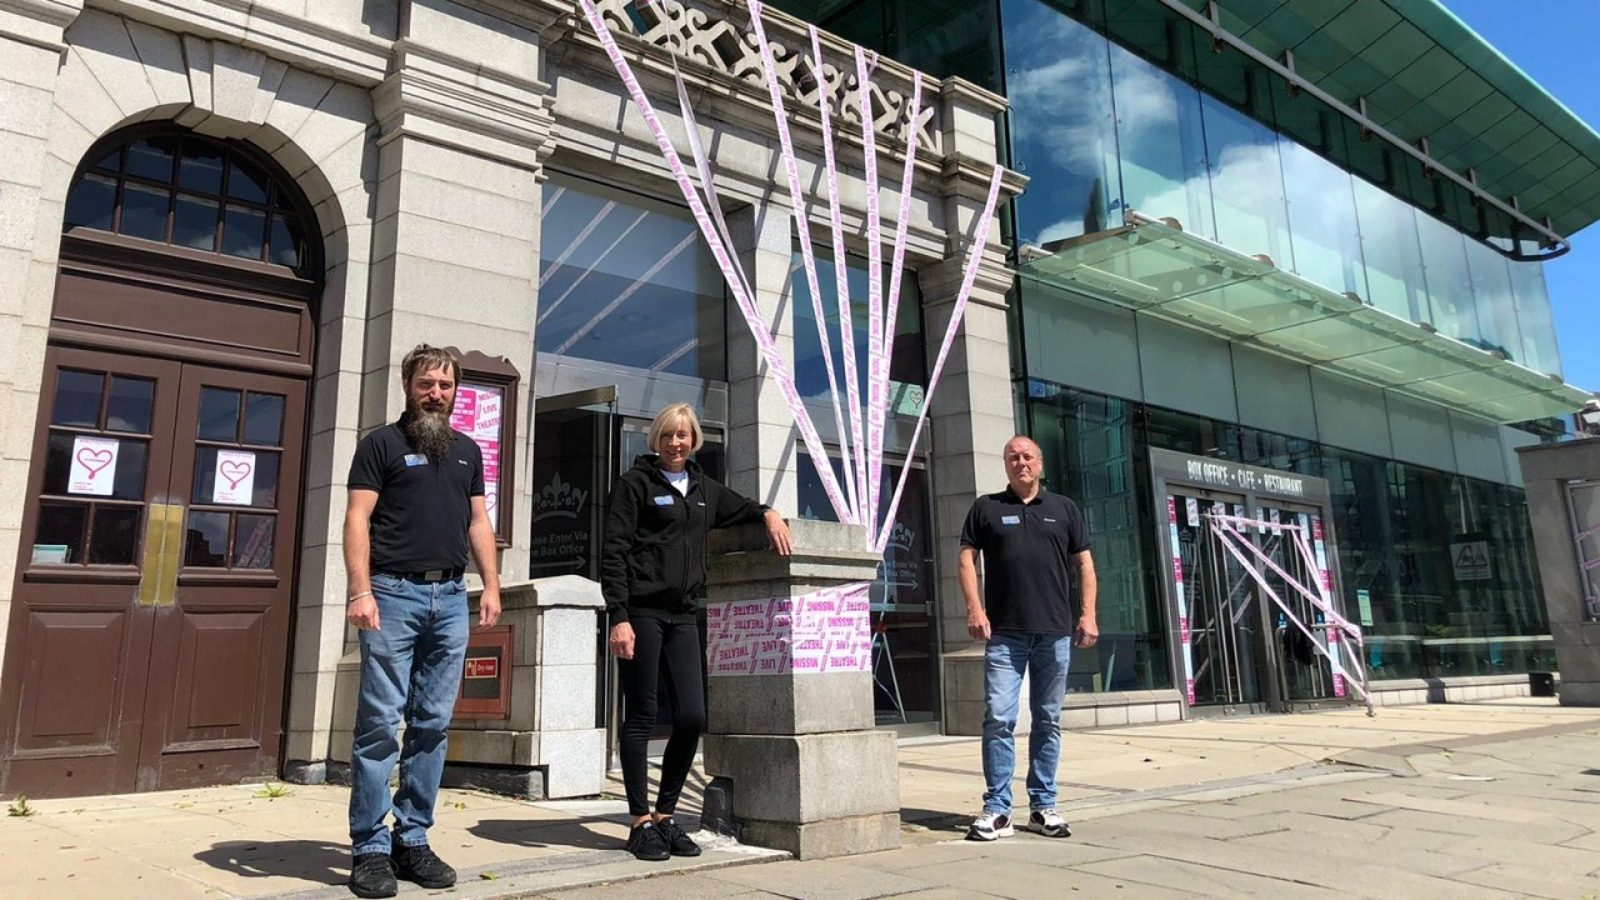 HMT joins forces in national campaign #MissingLiveTheatre